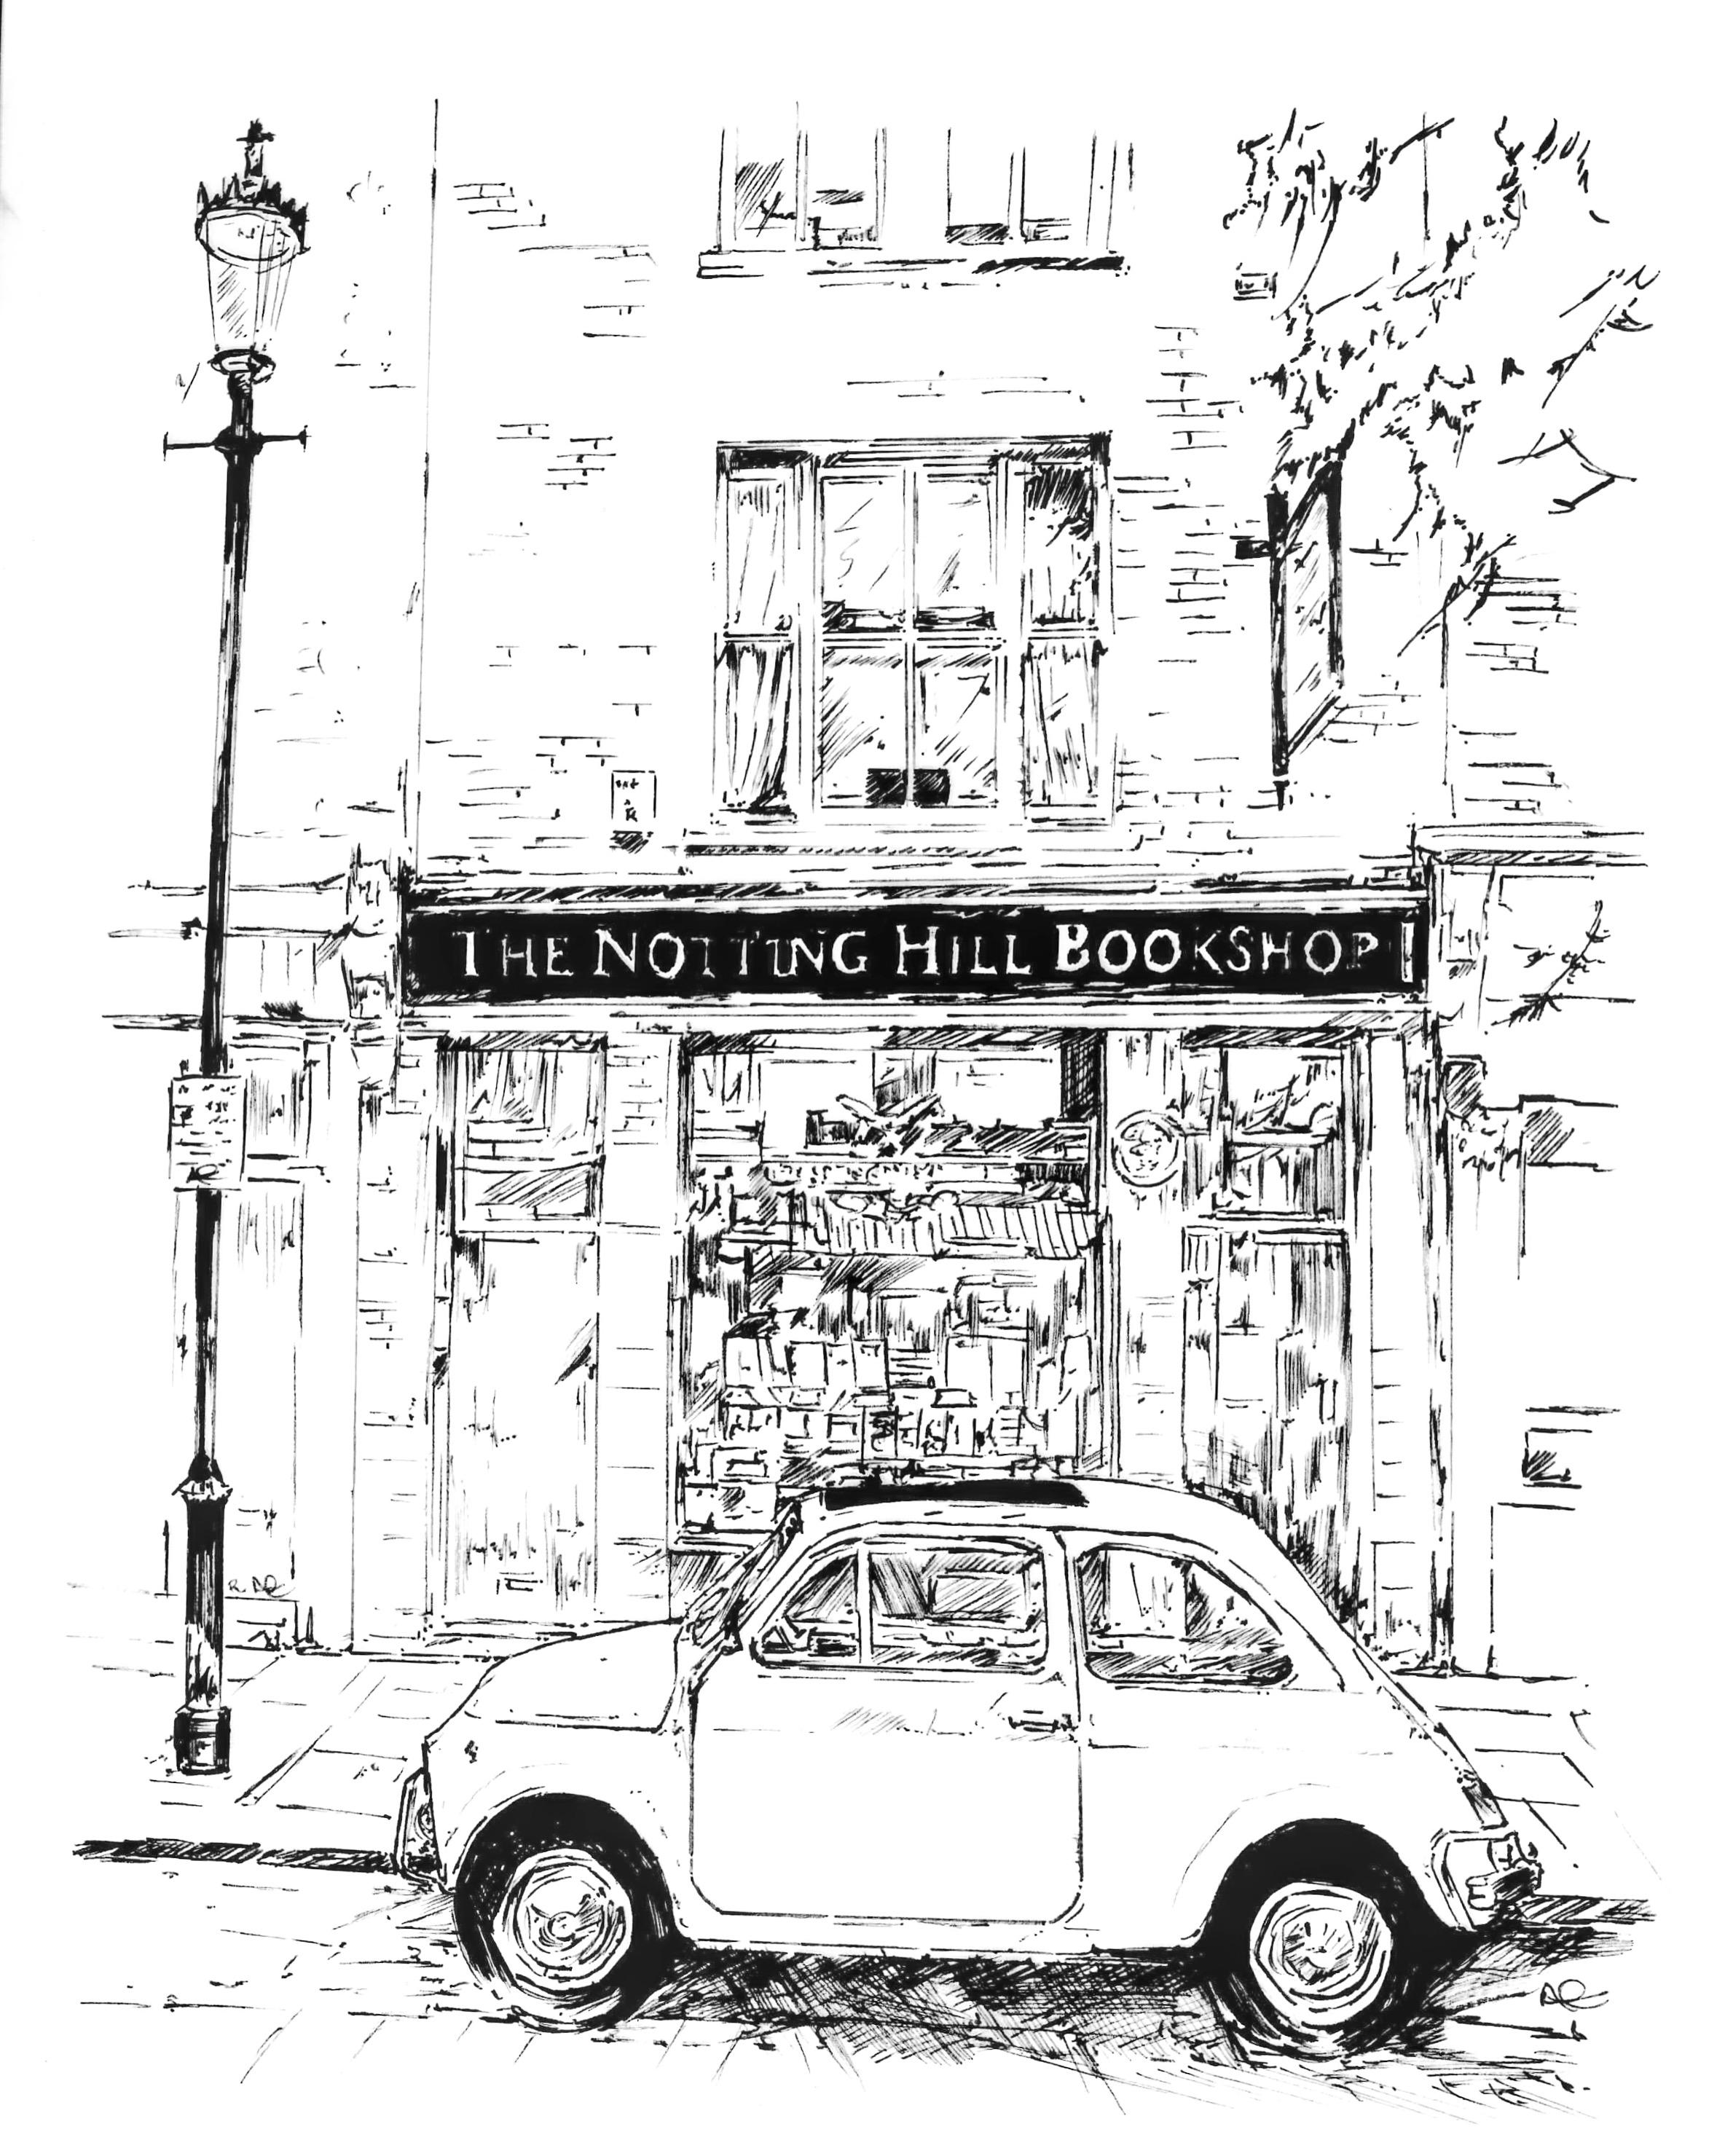 The Notting Hill Bookshop, Notting Hill